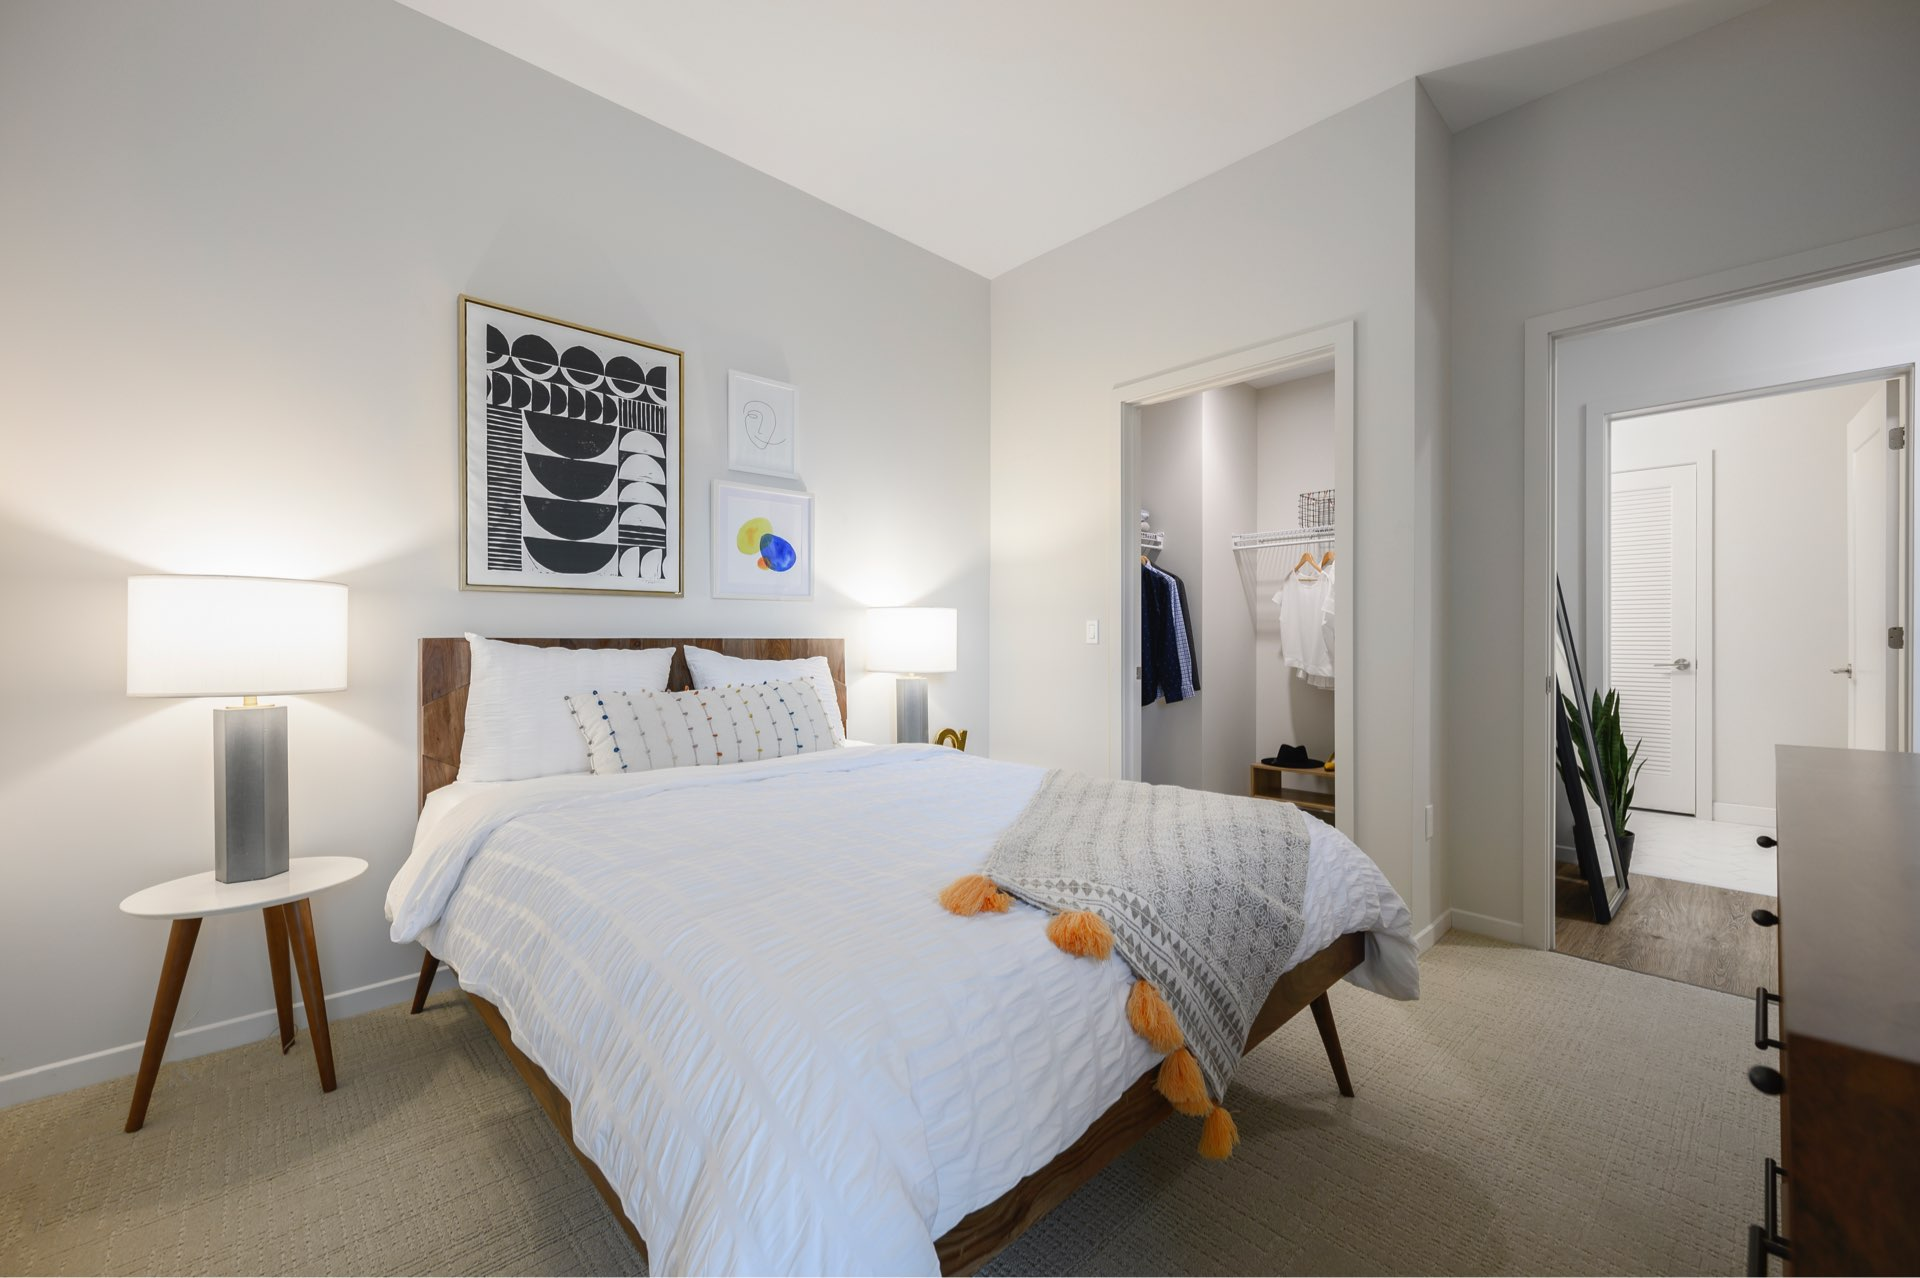 Apartments img 12